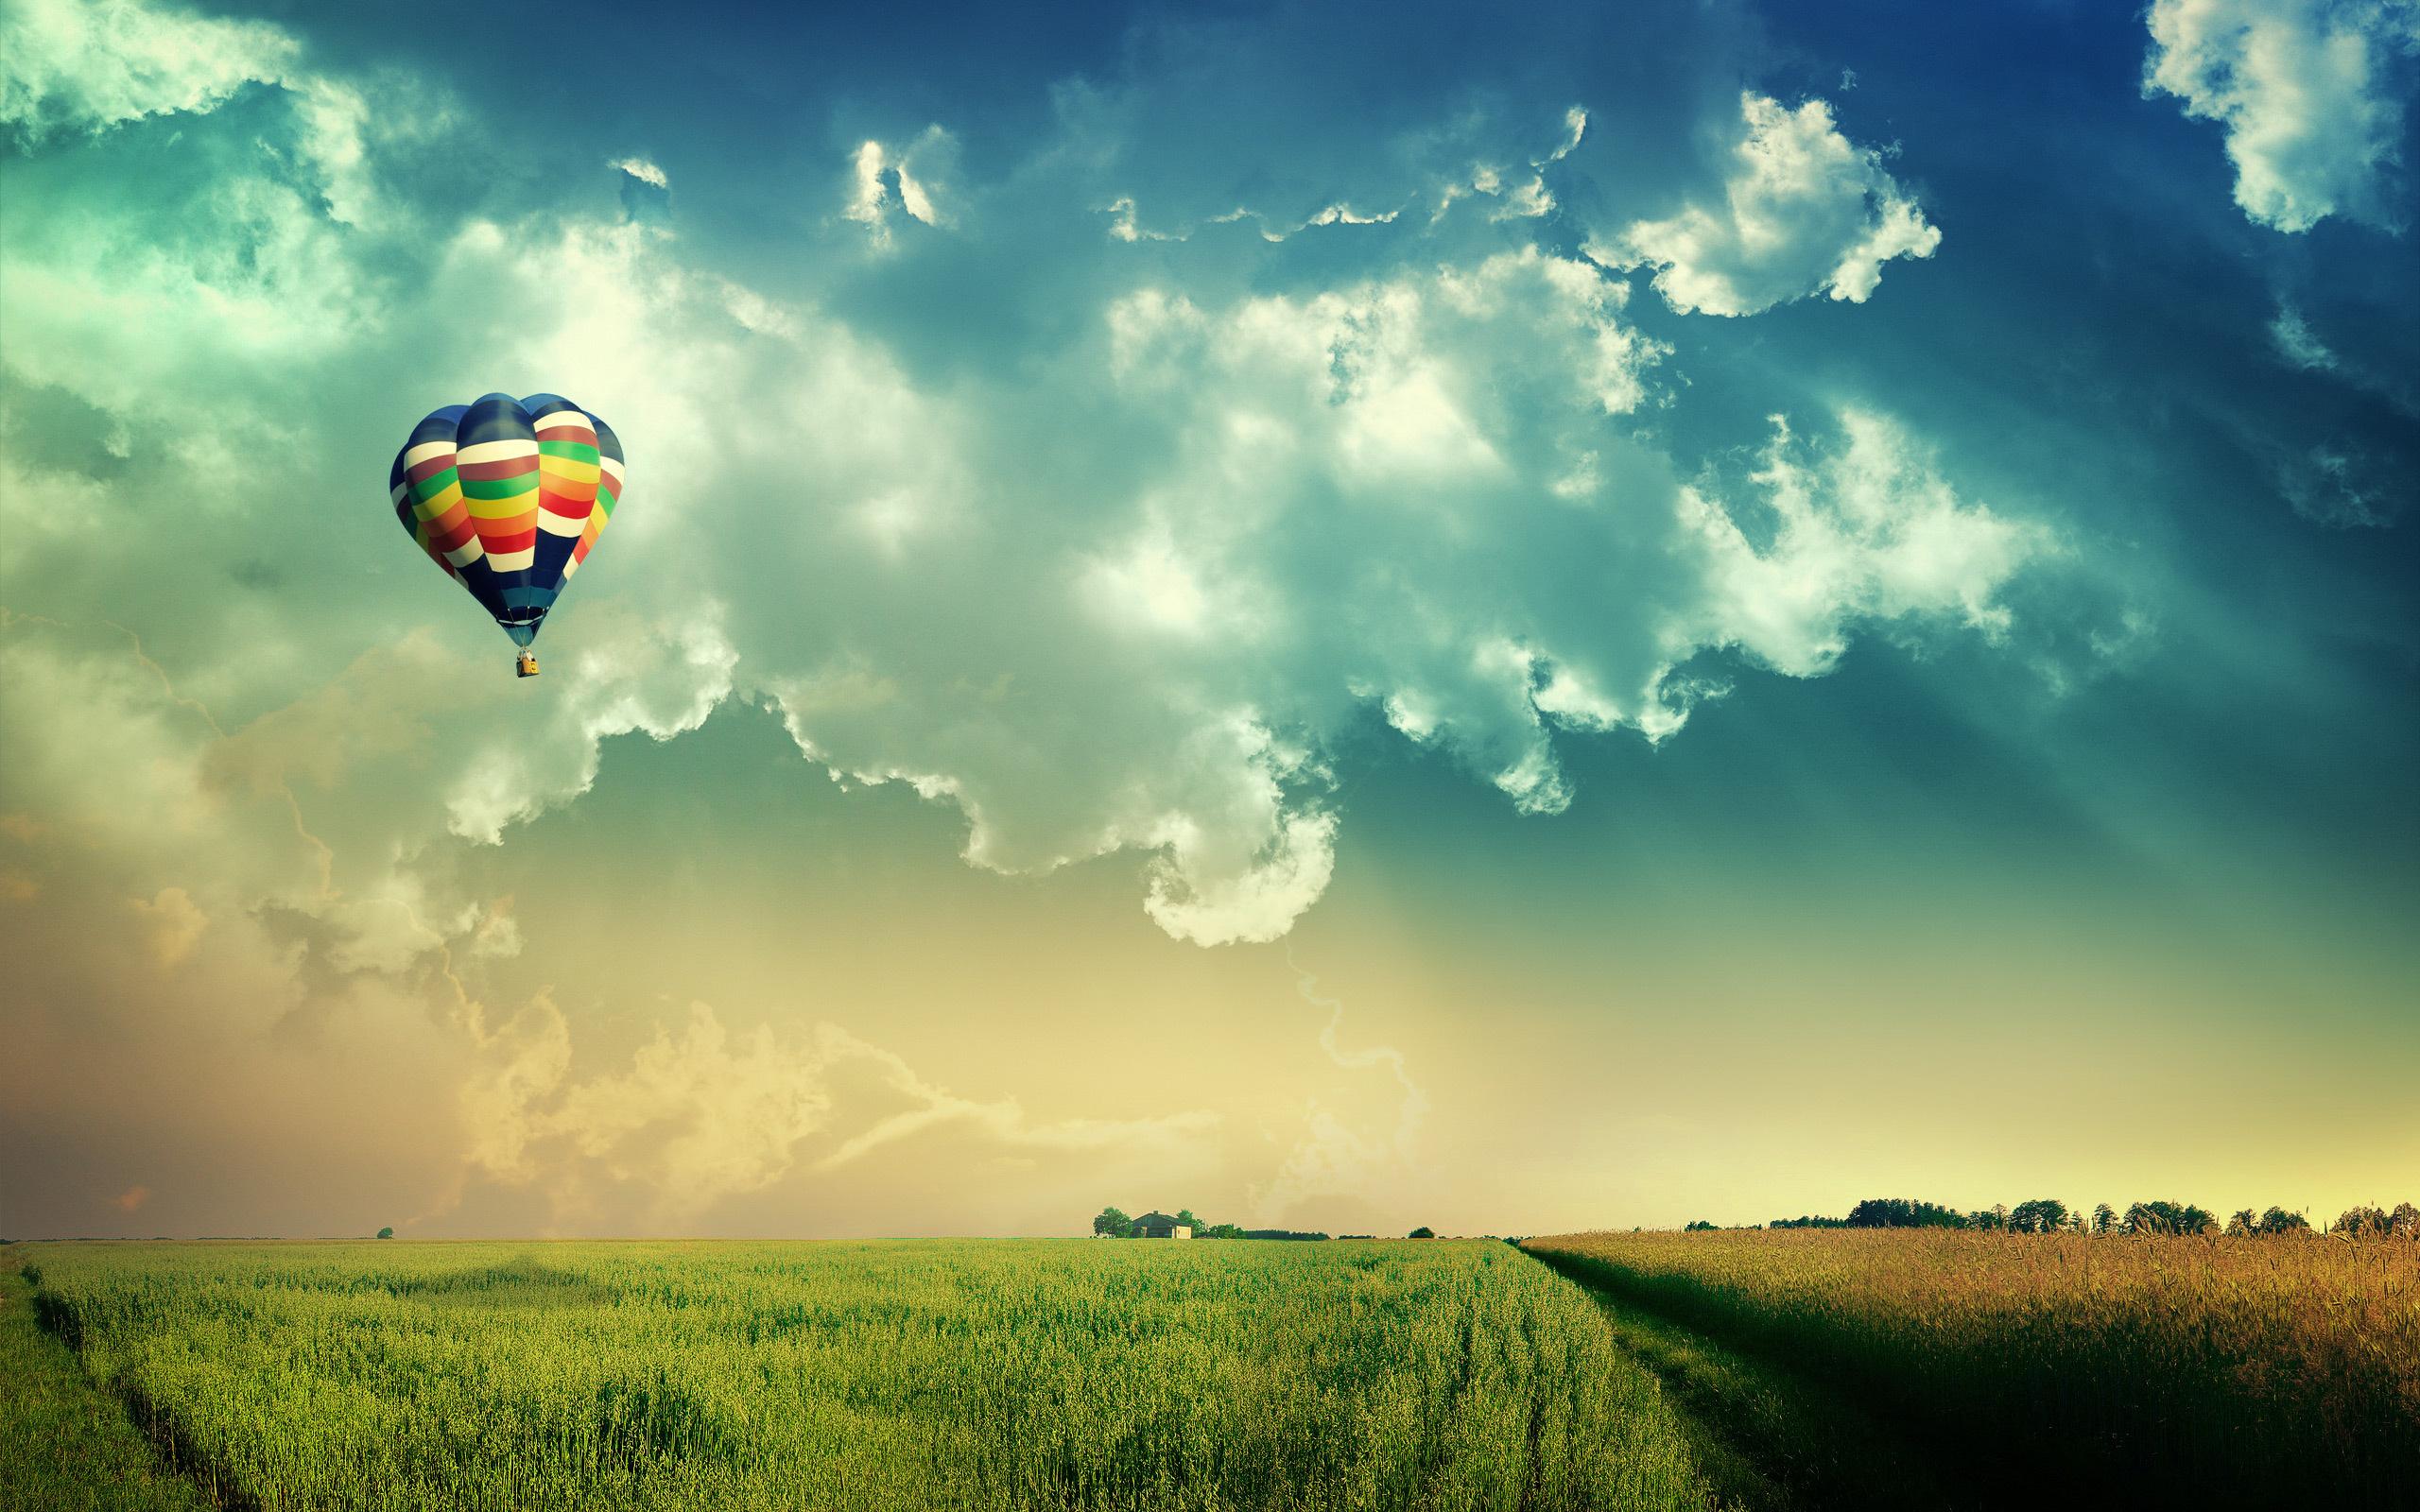 Beautiful Hot Air Balloon Wallpaper